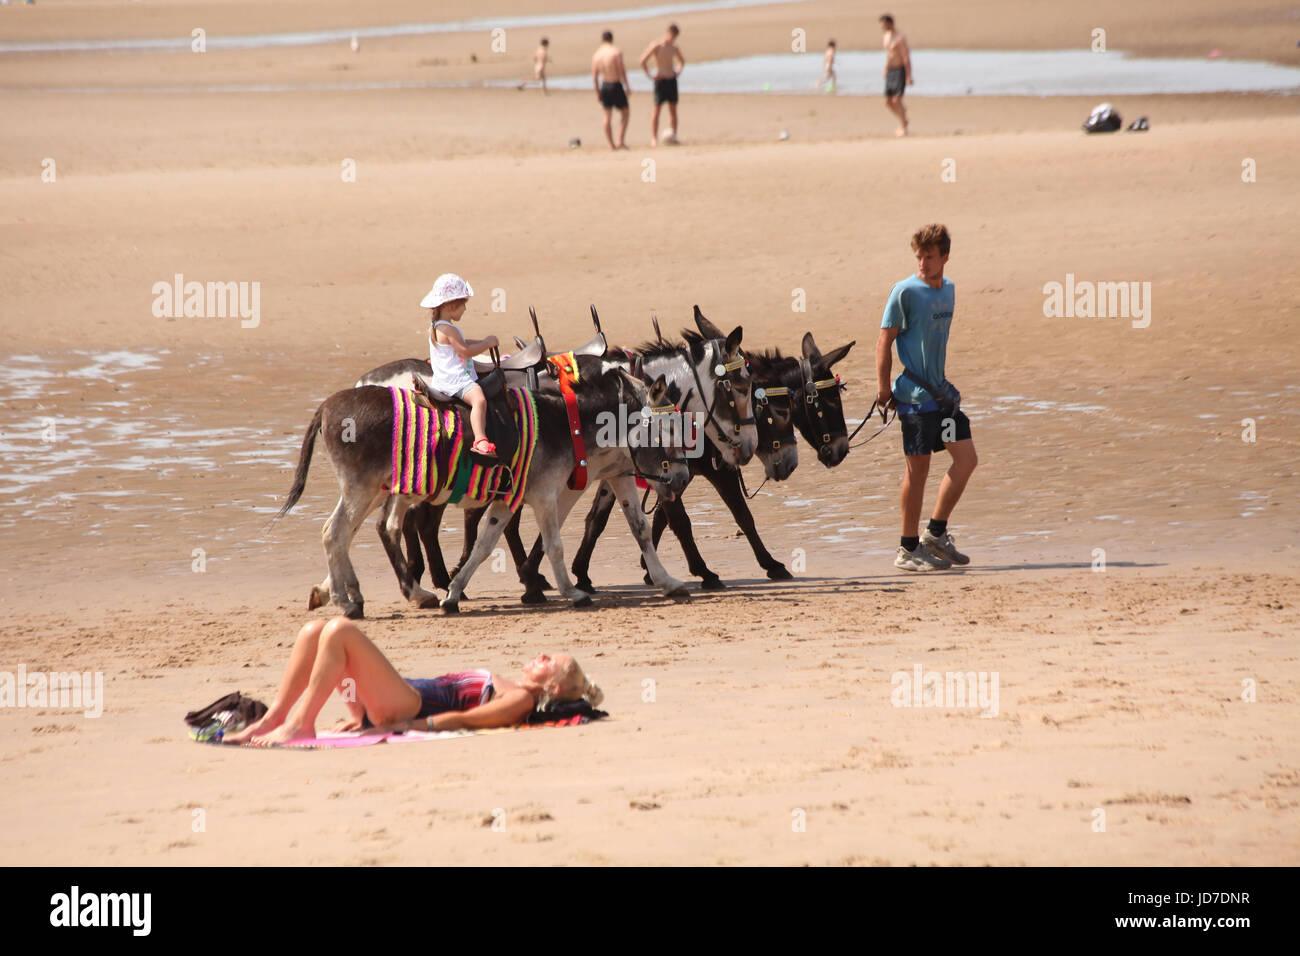 Blackpool, Lancashire, UK. 19th June, 2017. Blackpool Pleasure Beach, UK. Sunworshippers & familes enjoying - Stock Image